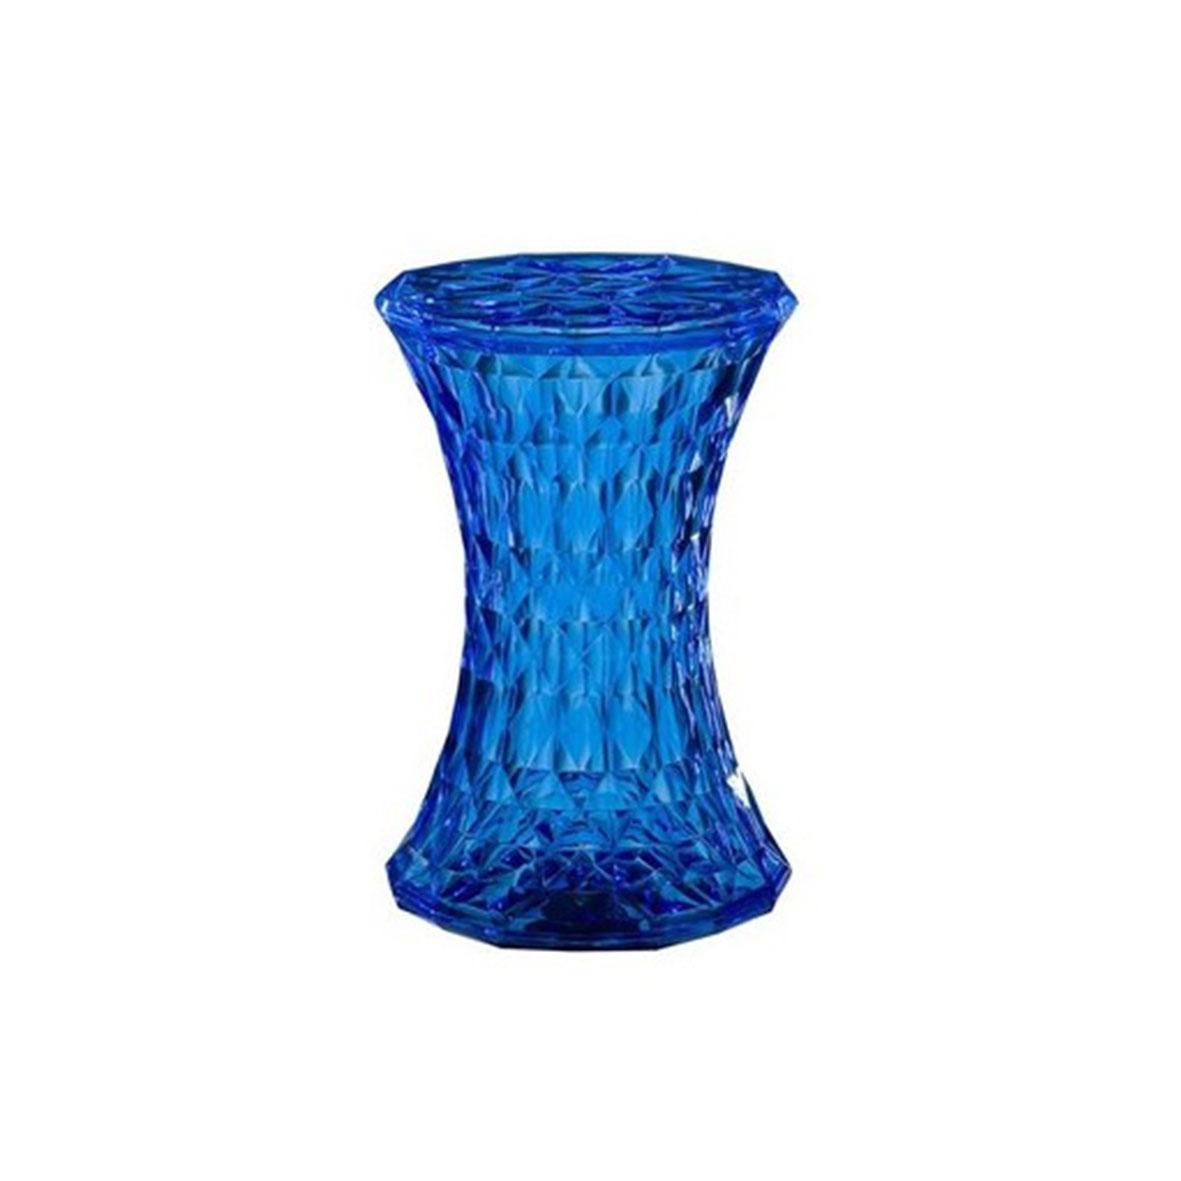 Banqueta Prism Cristal Azul